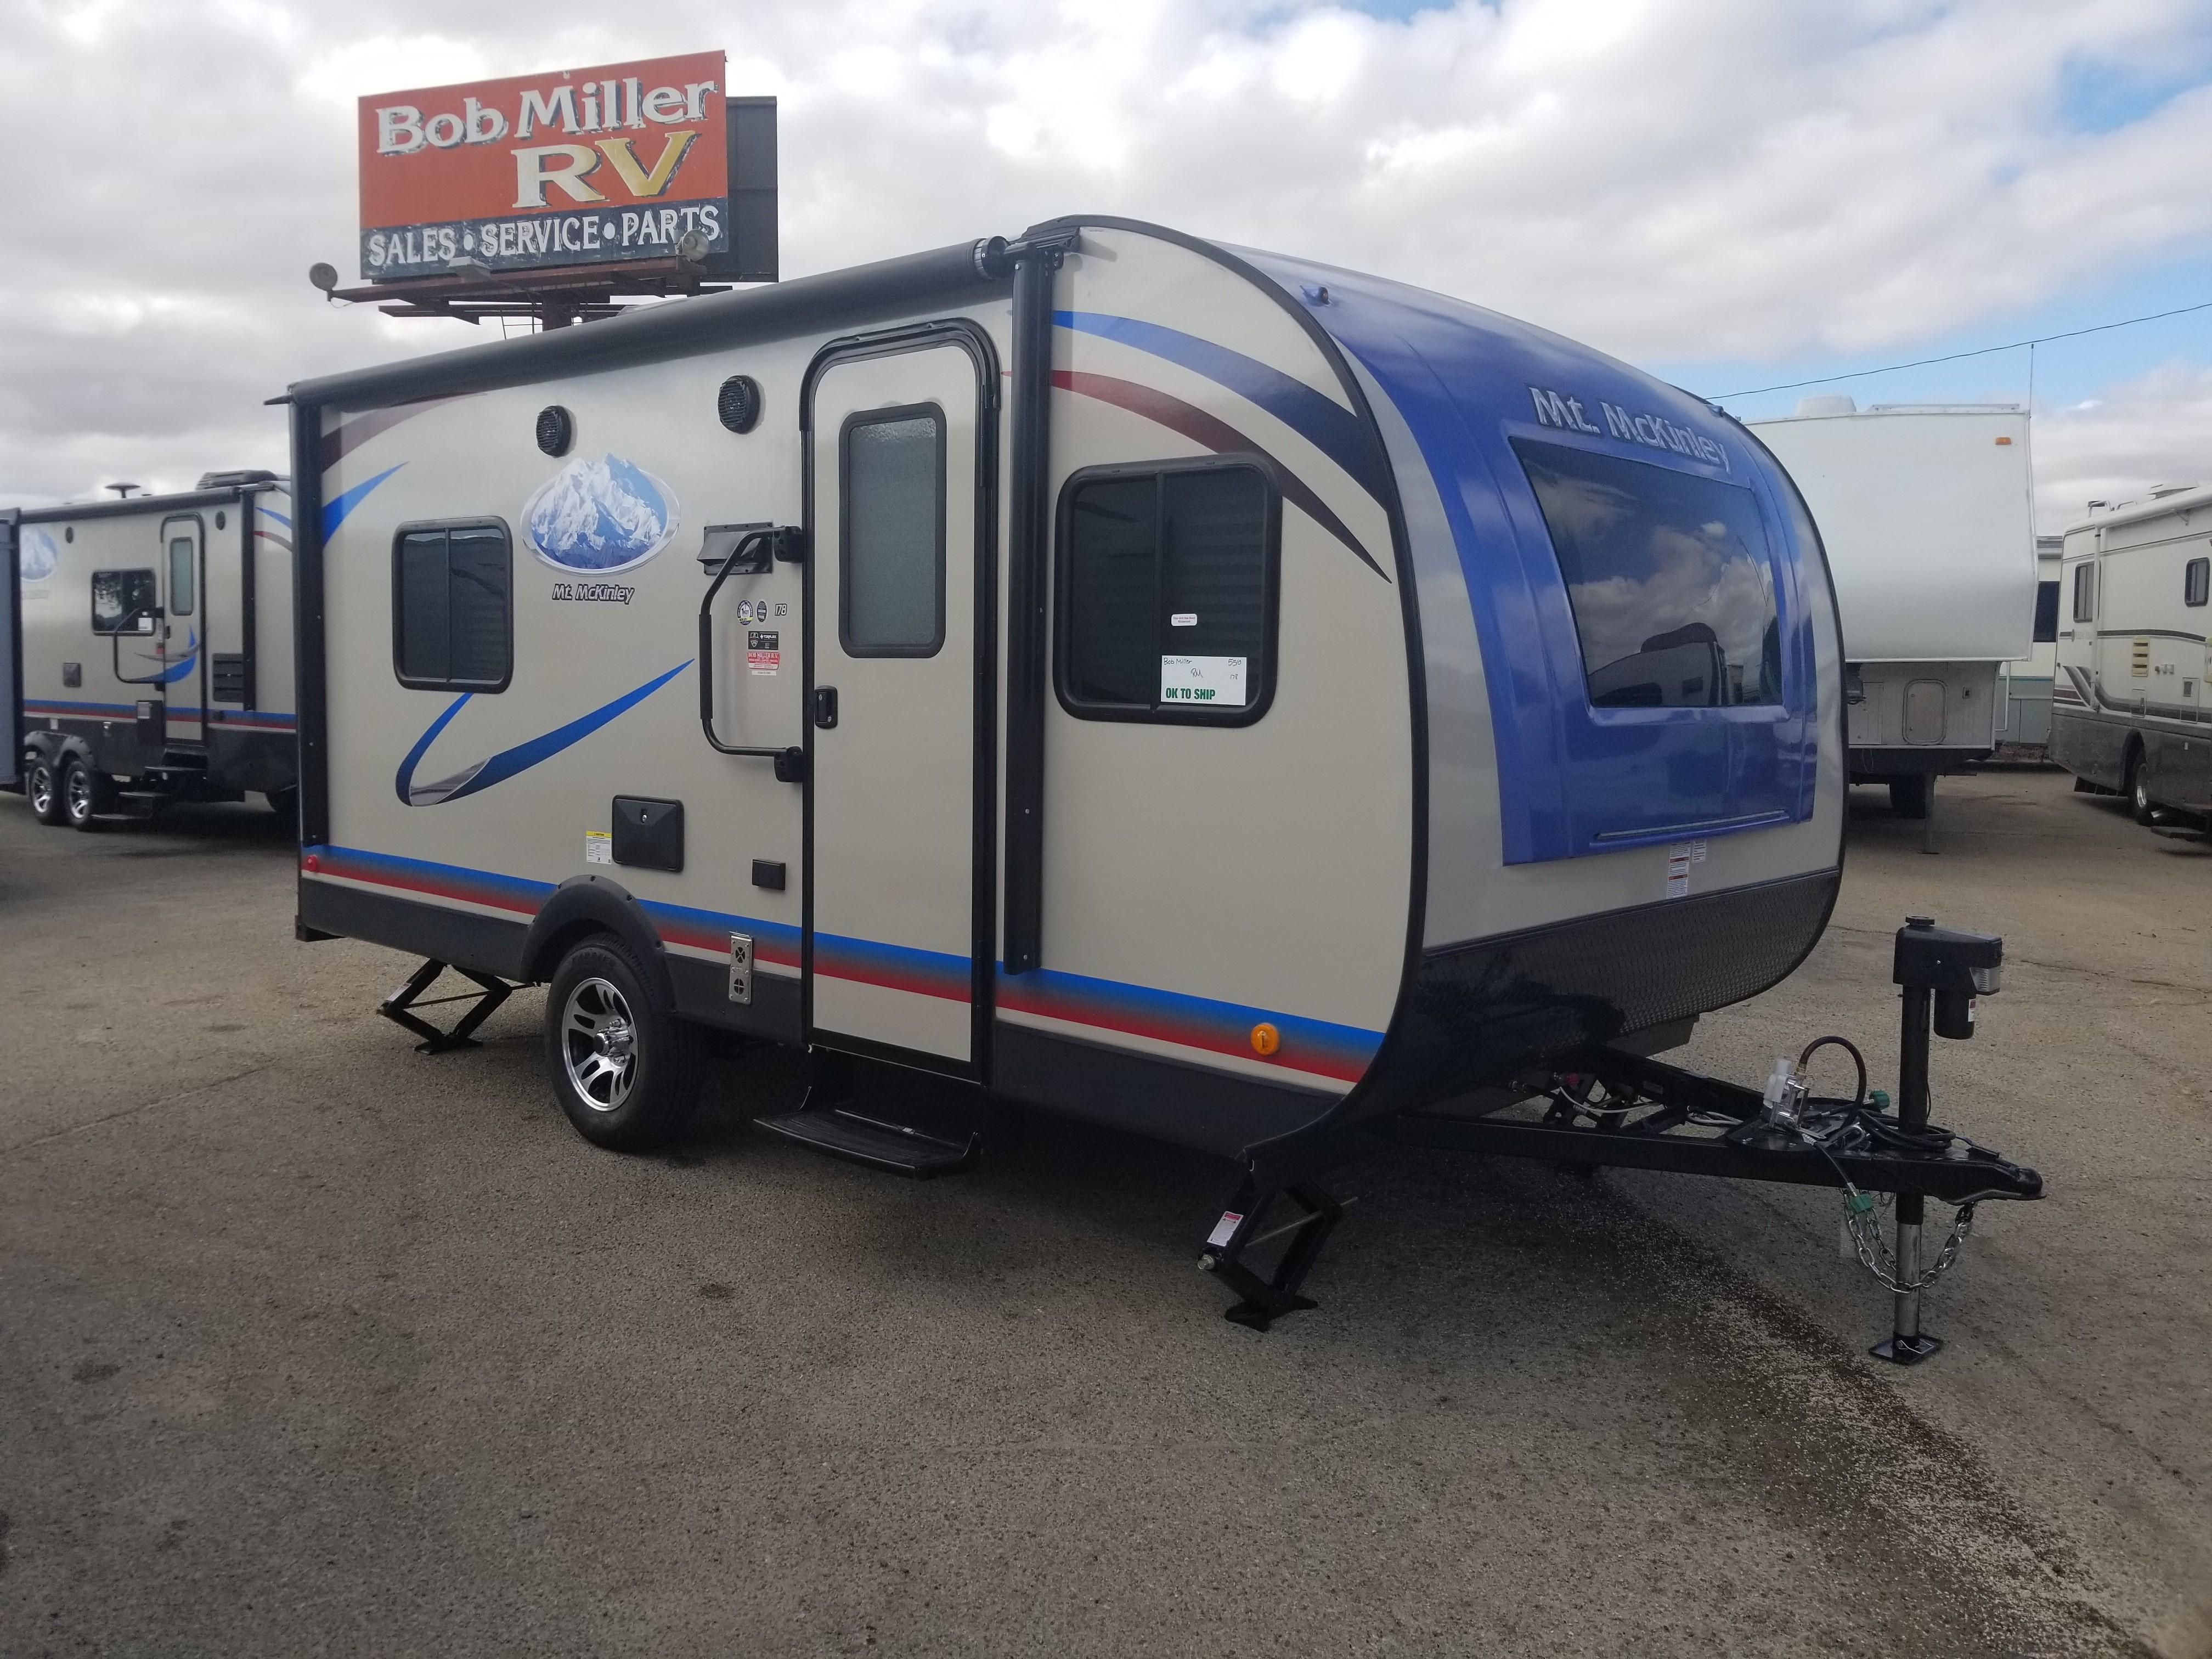 Bob Miller RV | RV sales in Beaumont, CA